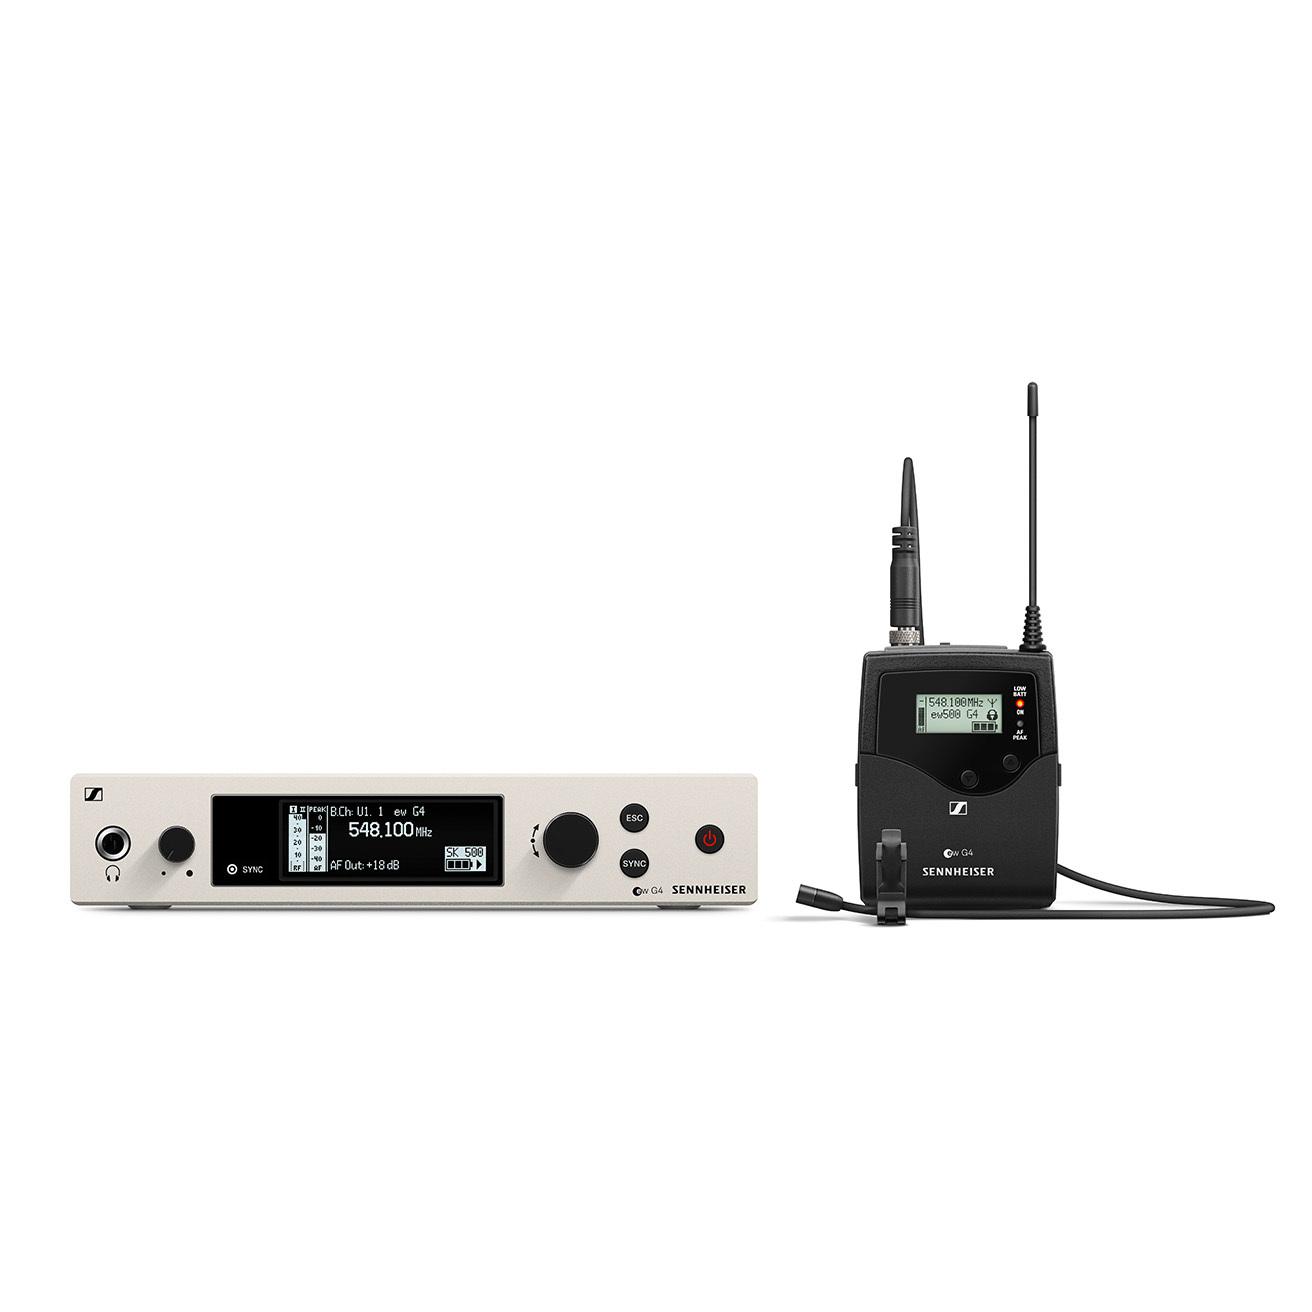 Sennheiser EW 500 G4-MKE2 Wireless Lavalier Microphone System